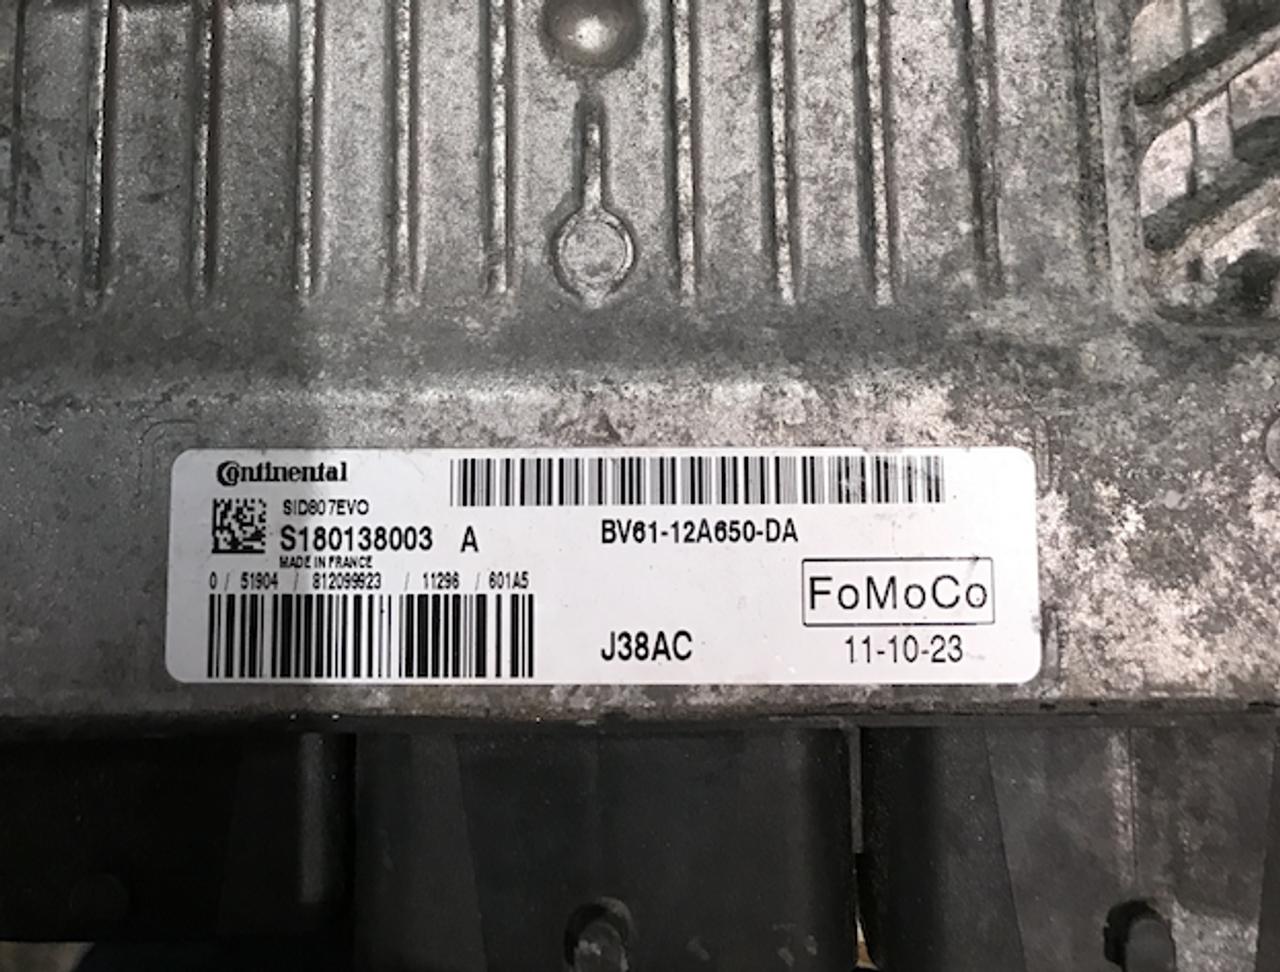 SID807EVO, J38AC, S180138003 A, BV61-12A650-DA, BV61-12A650DA